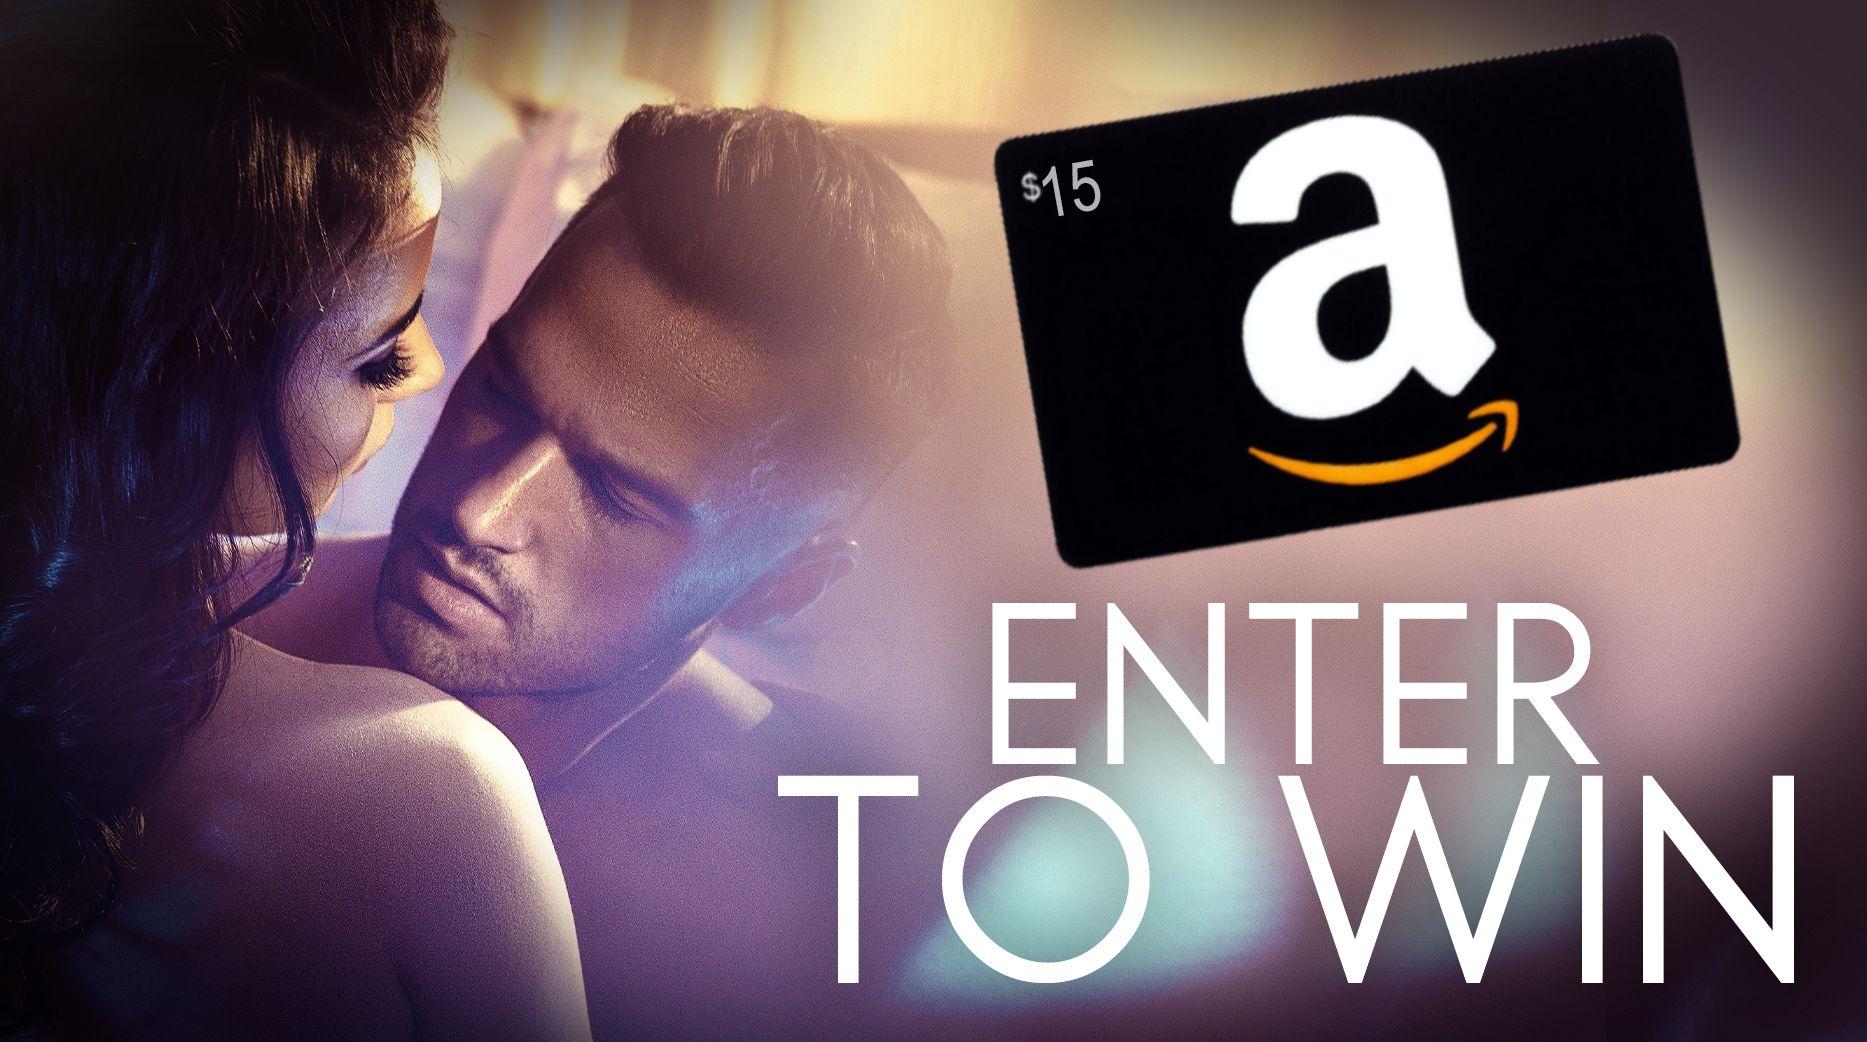 Enter to win a 15 amazon gift card paranormal